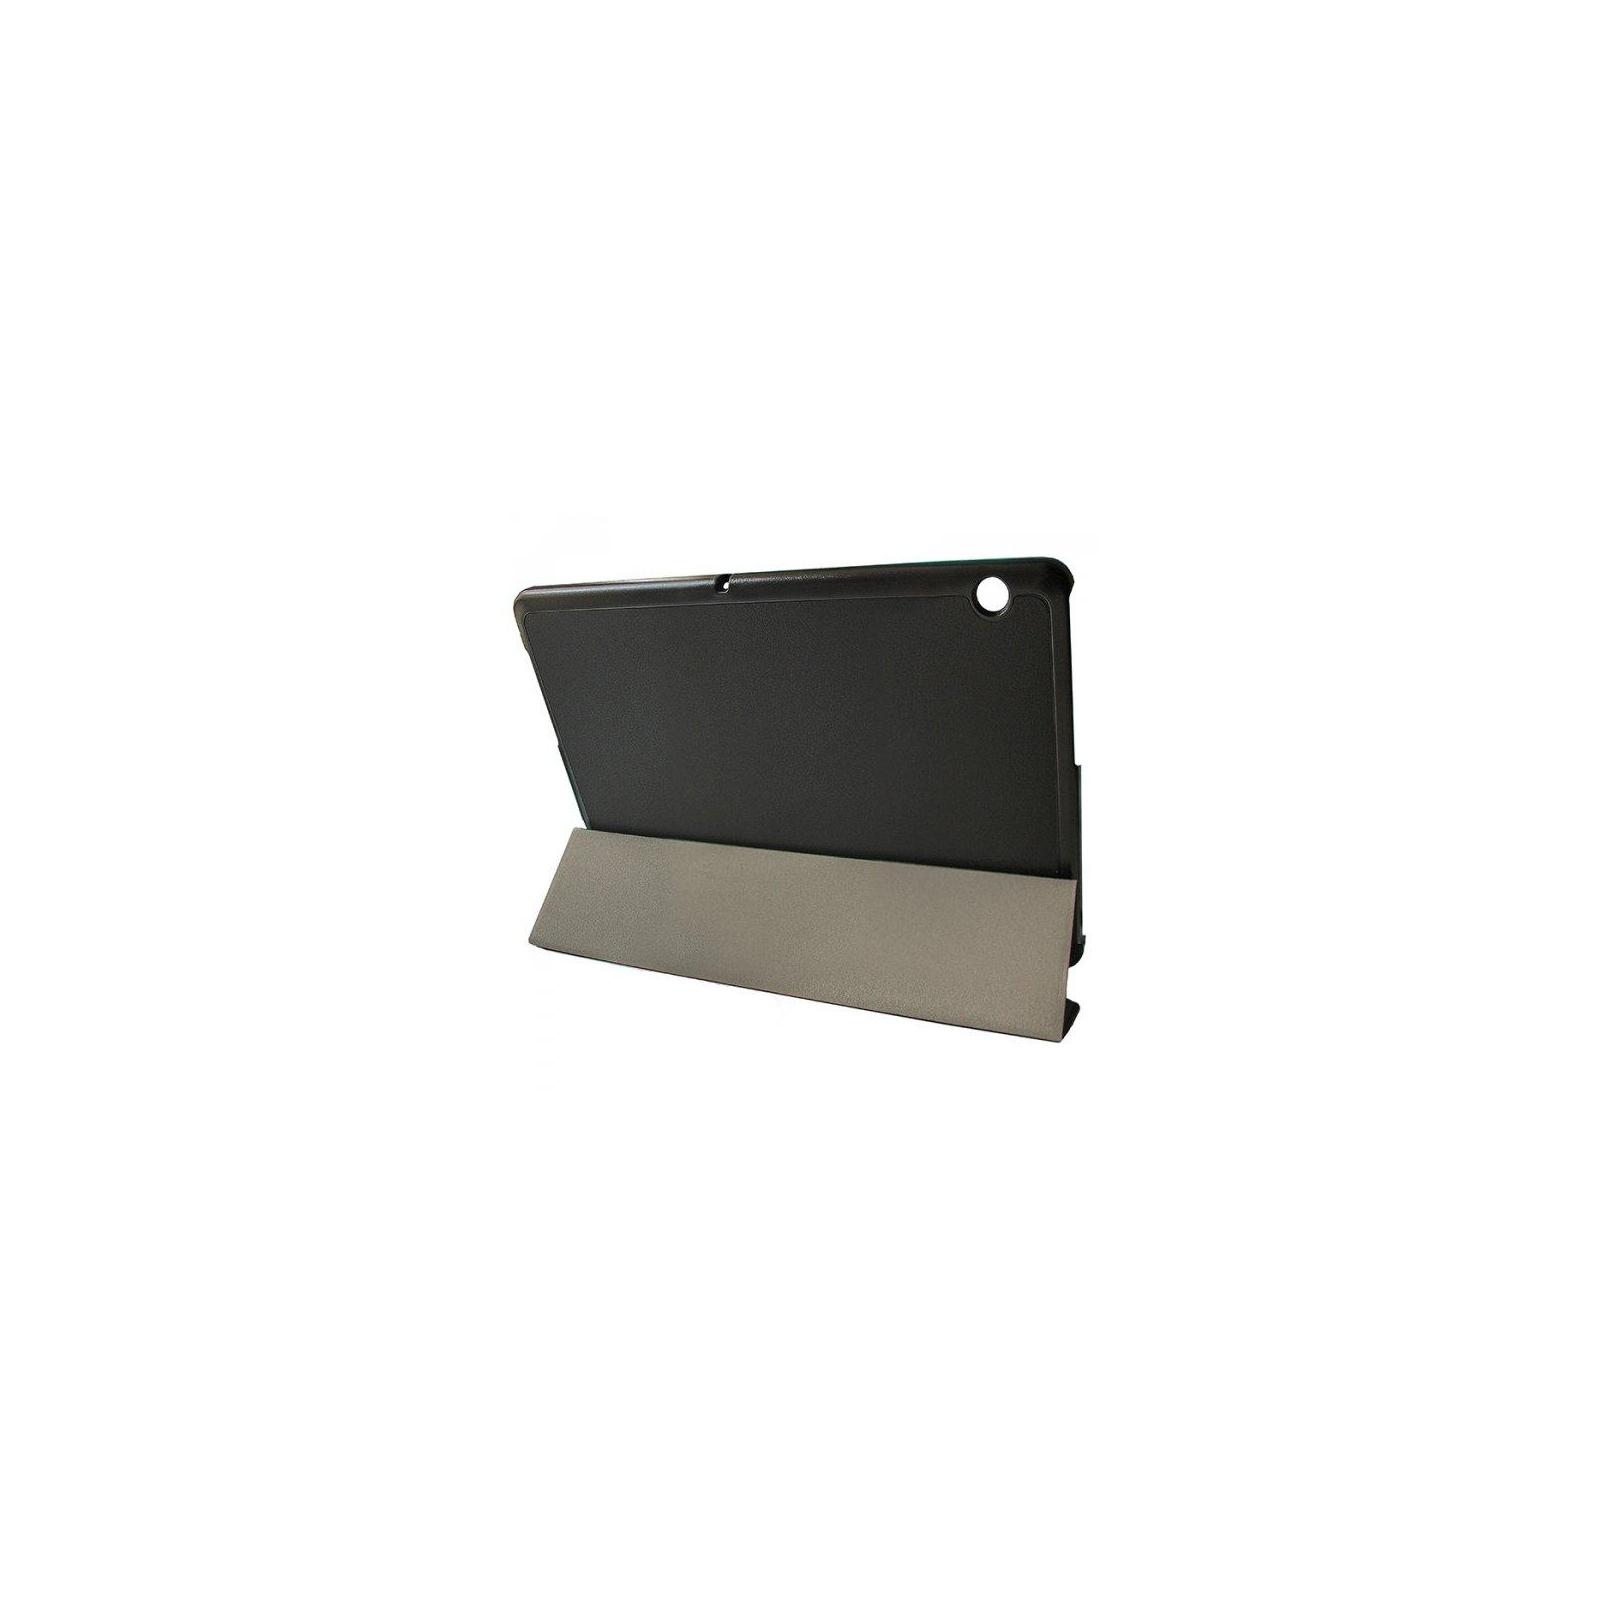 Чехол для планшета Grand-X для Huawei T3-10 Black (HTC-HT310B) изображение 5